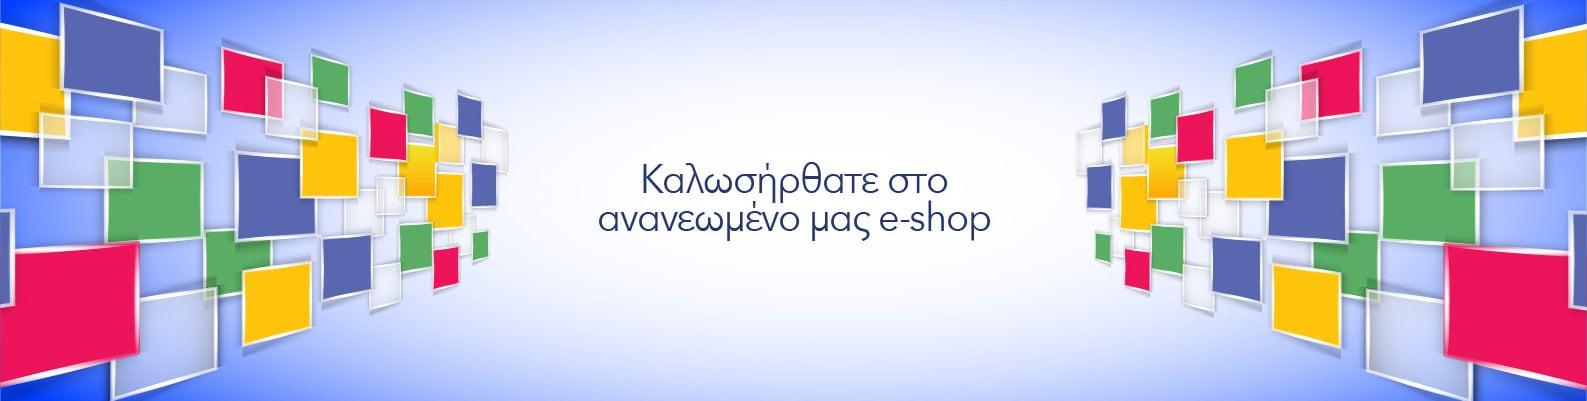 e-shop-slider-kalwsirthate-2